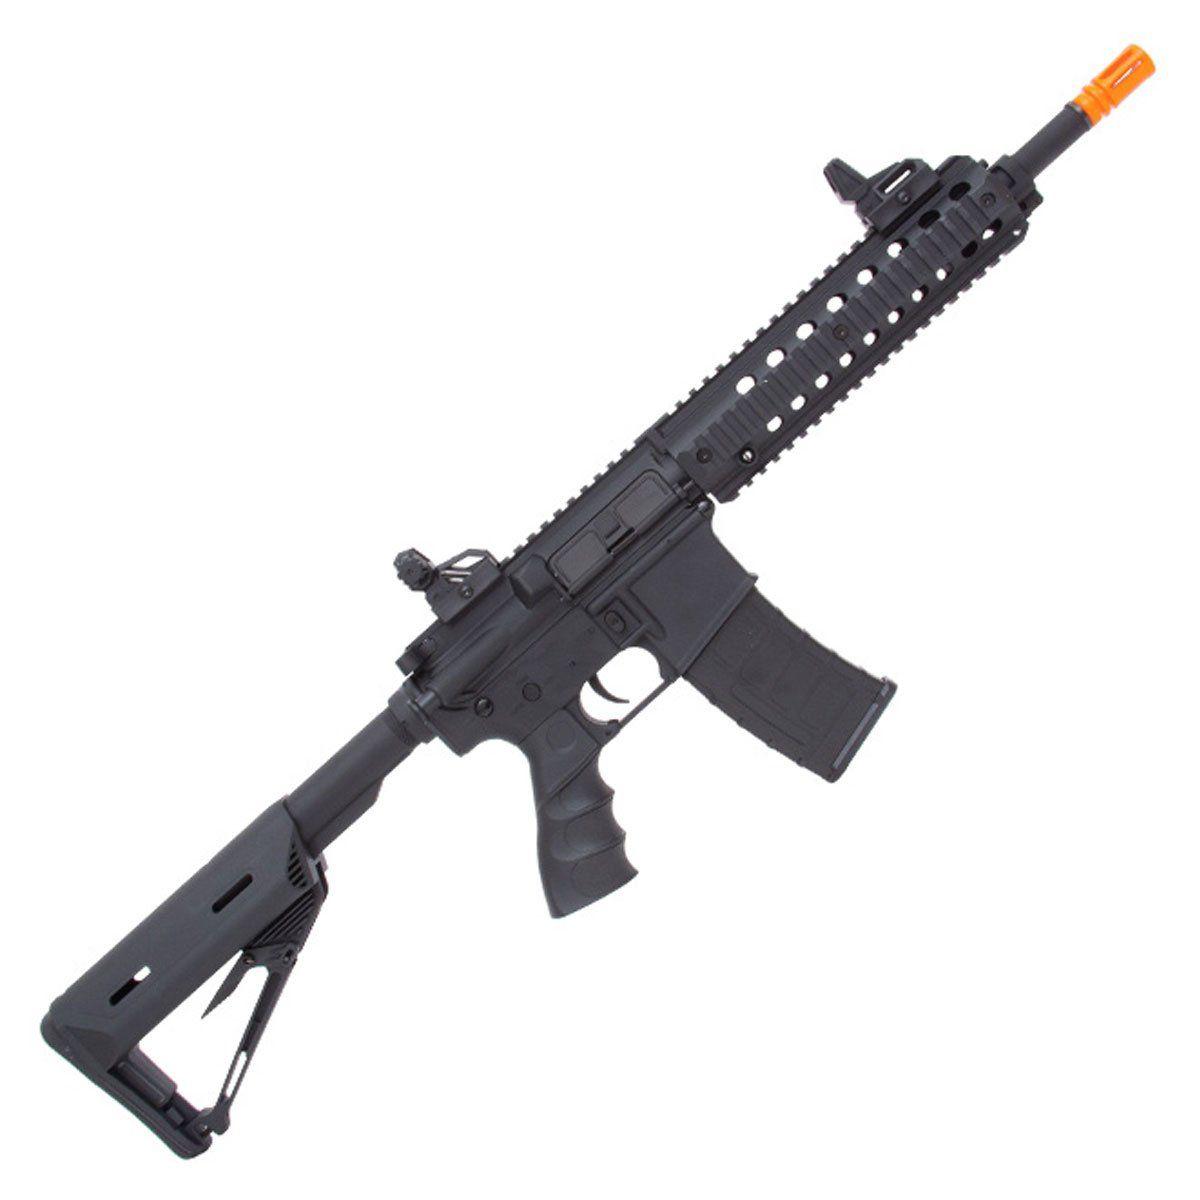 Rifle de Airsoft SRC SR-47 GE-1604 Semi Metal Elétrico